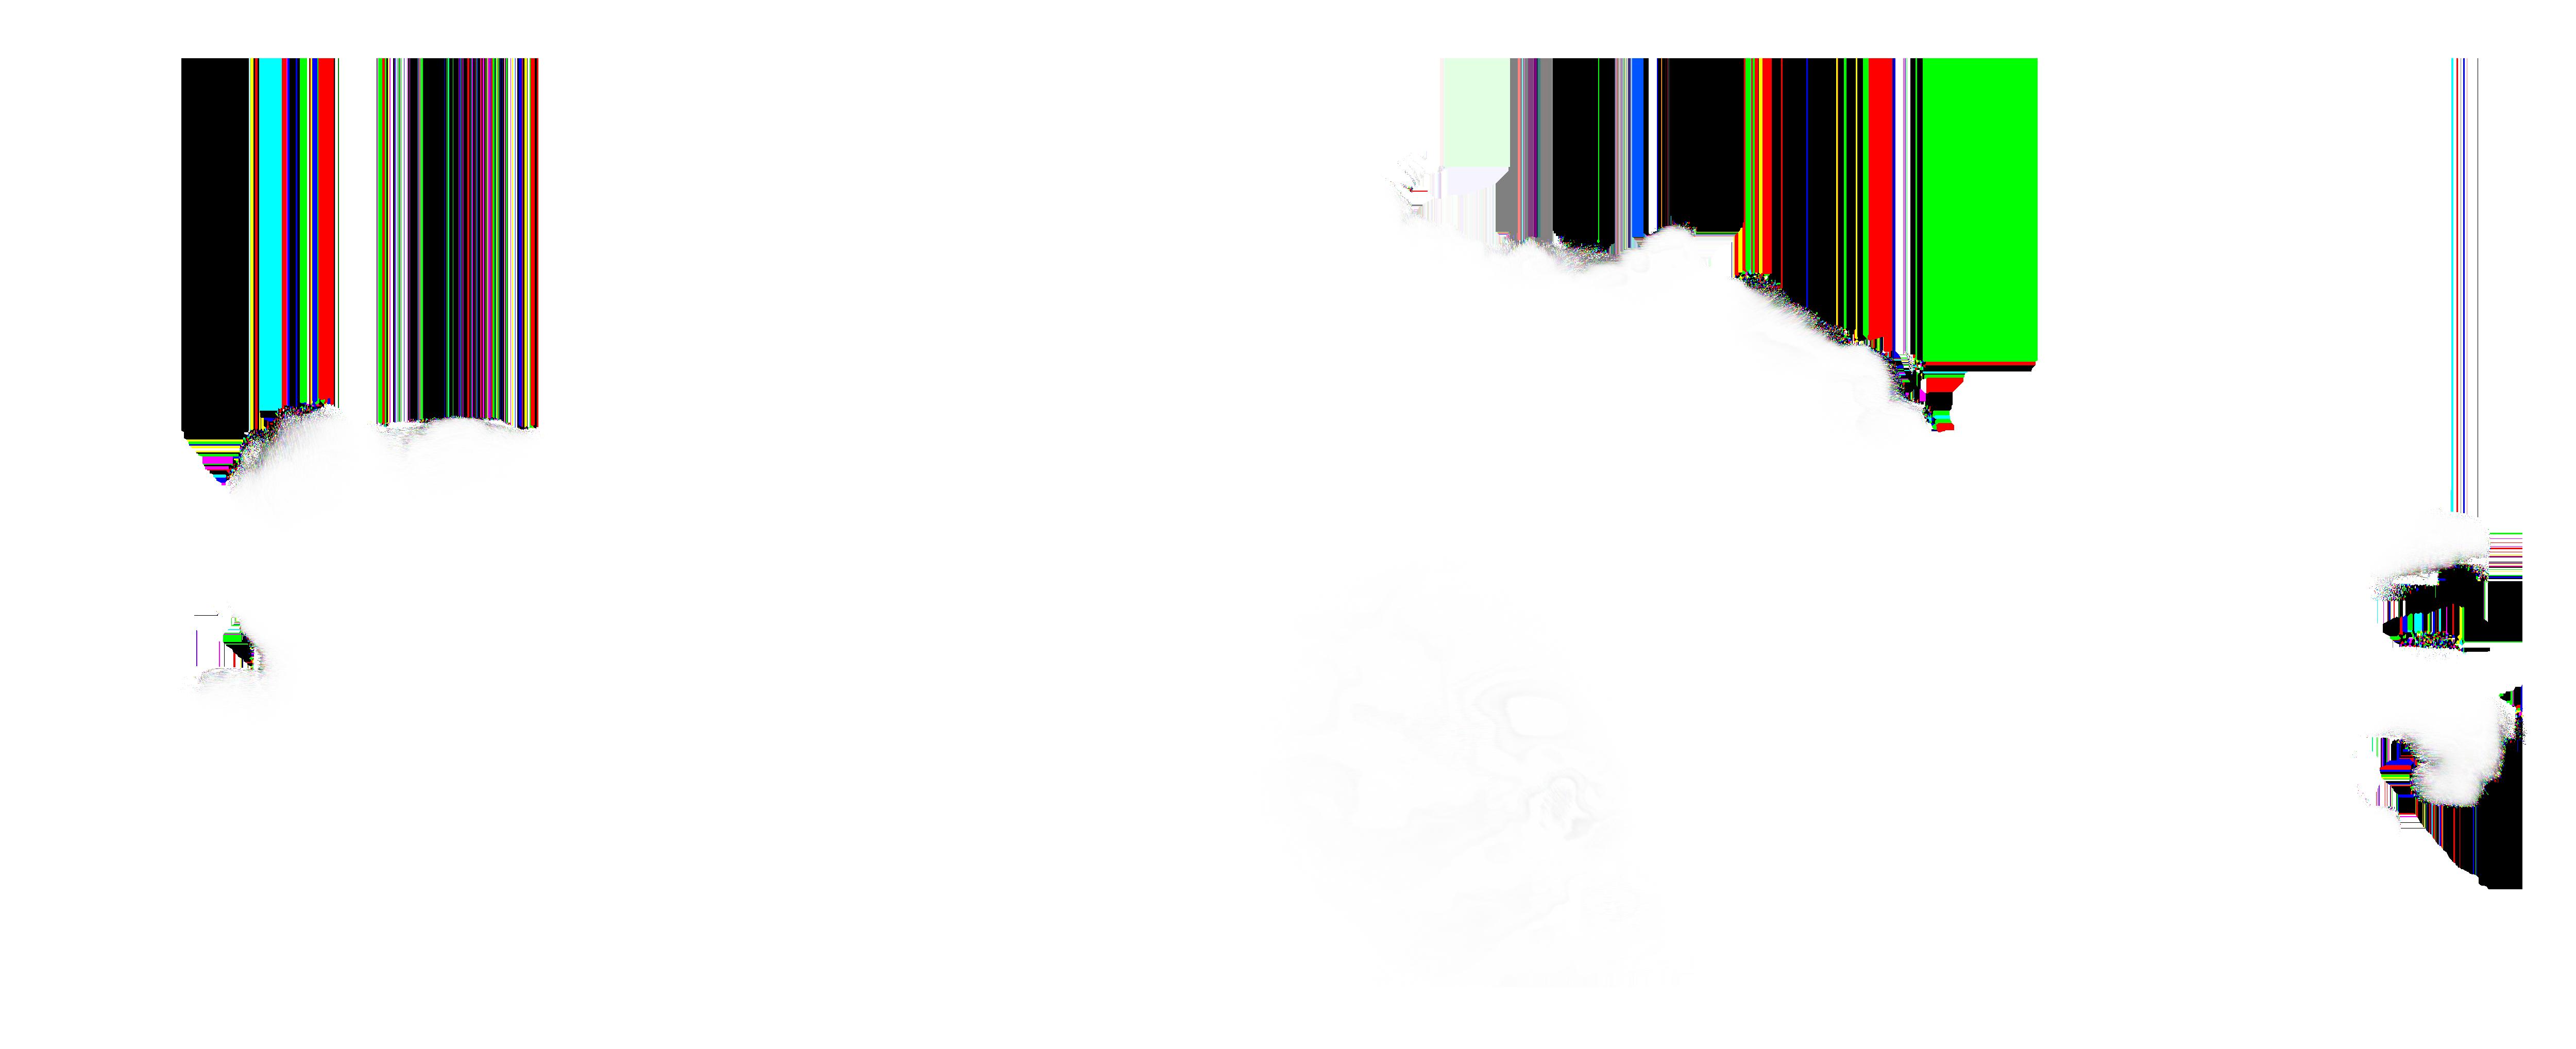 Cloud png images. Big white clipart best